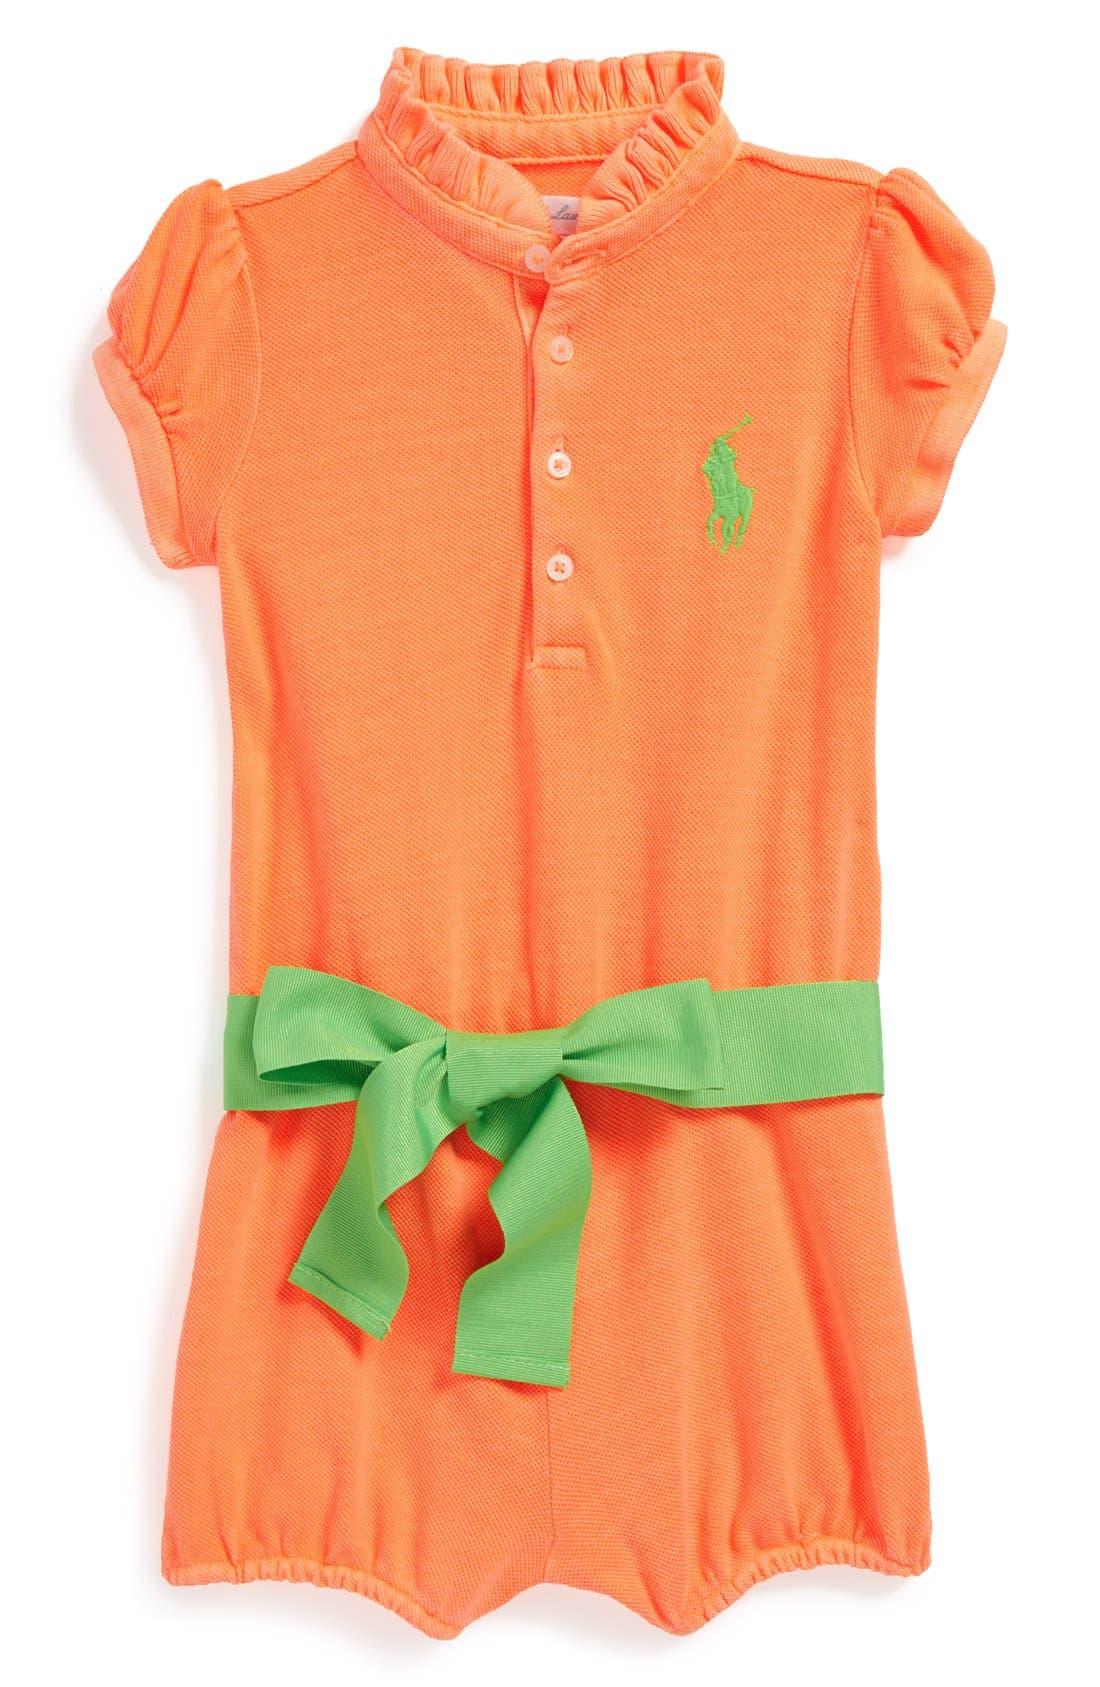 Alternate Image 1 Selected - Ralph Lauren Ruffle Collar Romper (Baby Girls)